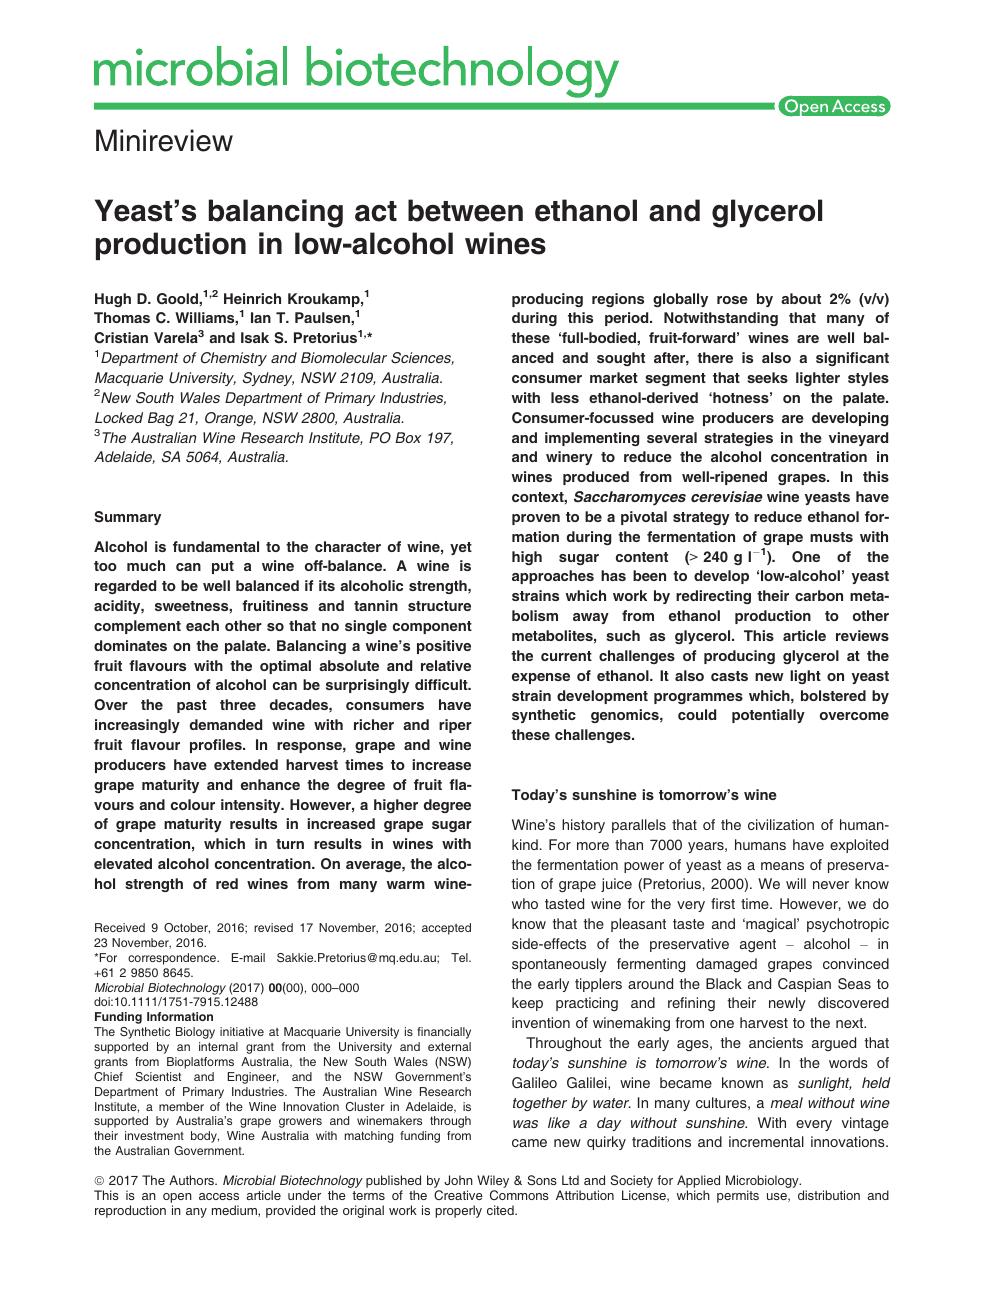 Yeast's balancing act between ethanol and glycerol